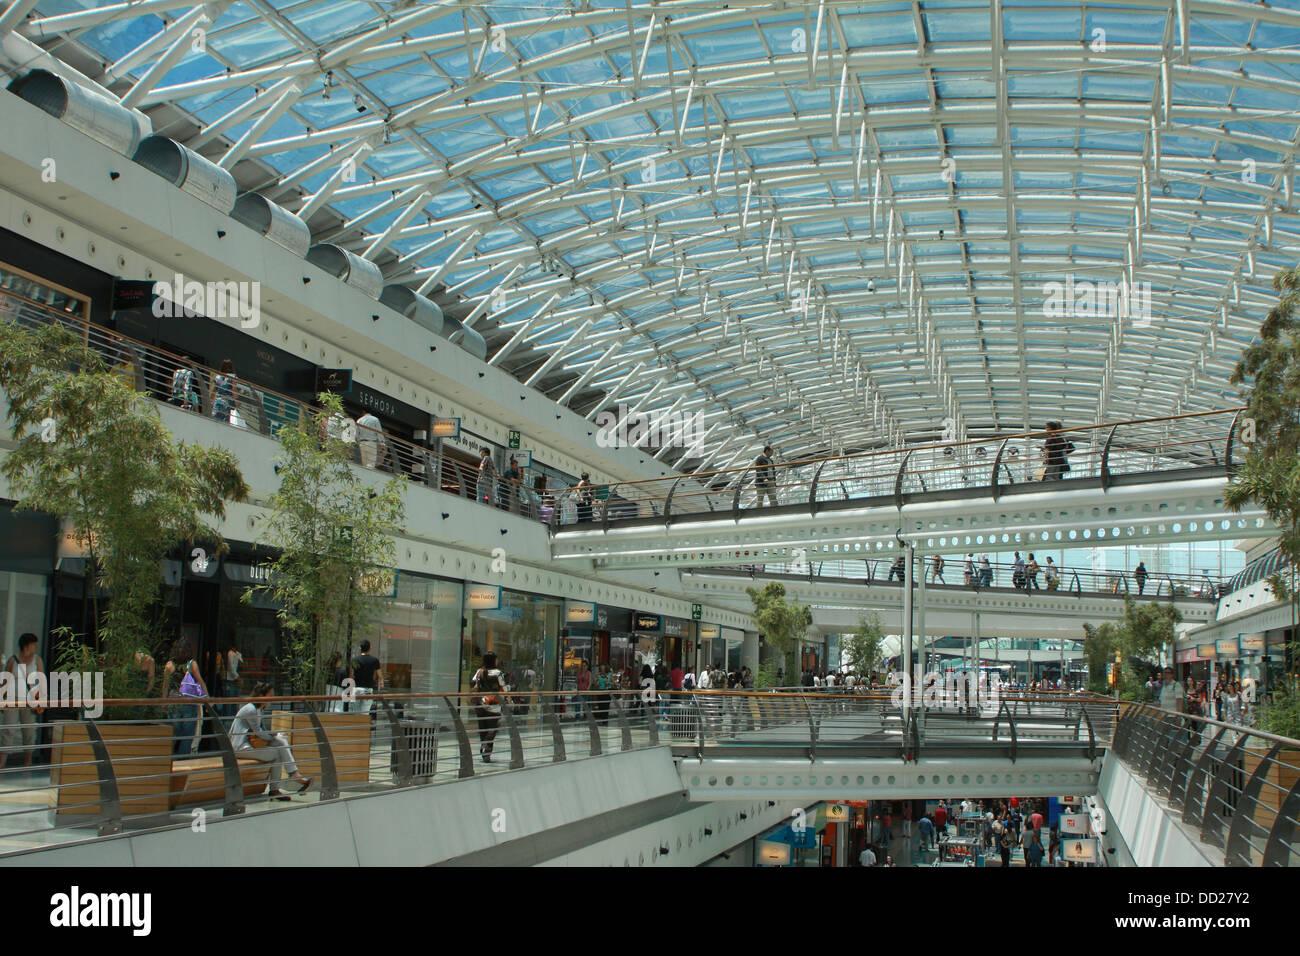 Portugal estremadura lisbon vasco da gama shopping centre in portugal estremadura lisbon vasco da gama shopping centre in the park of nations sciox Gallery